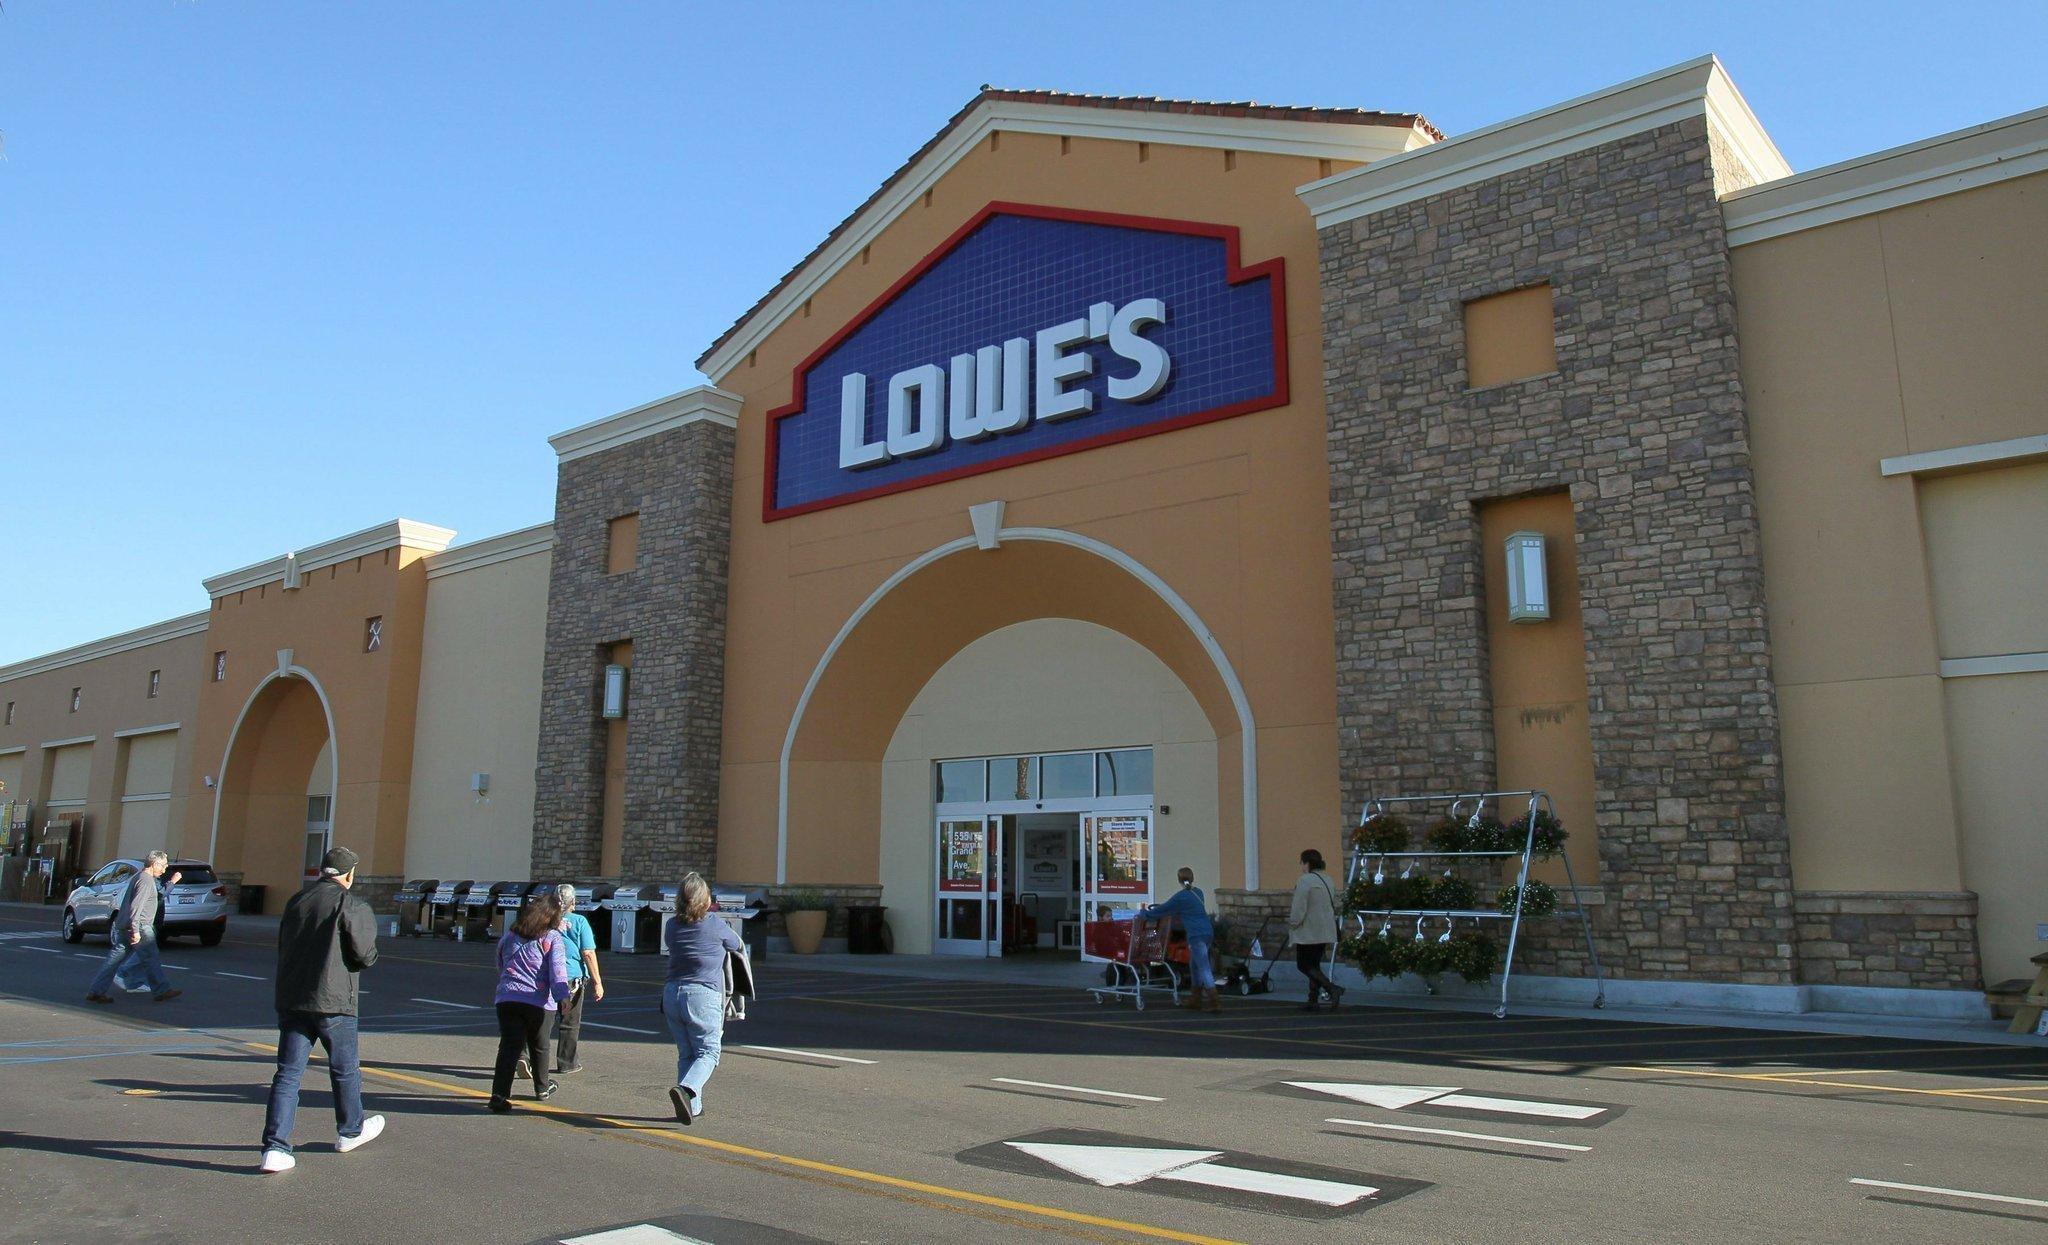 Sm Will Buy Closing Lowe S Store The San Diego Union Tribune